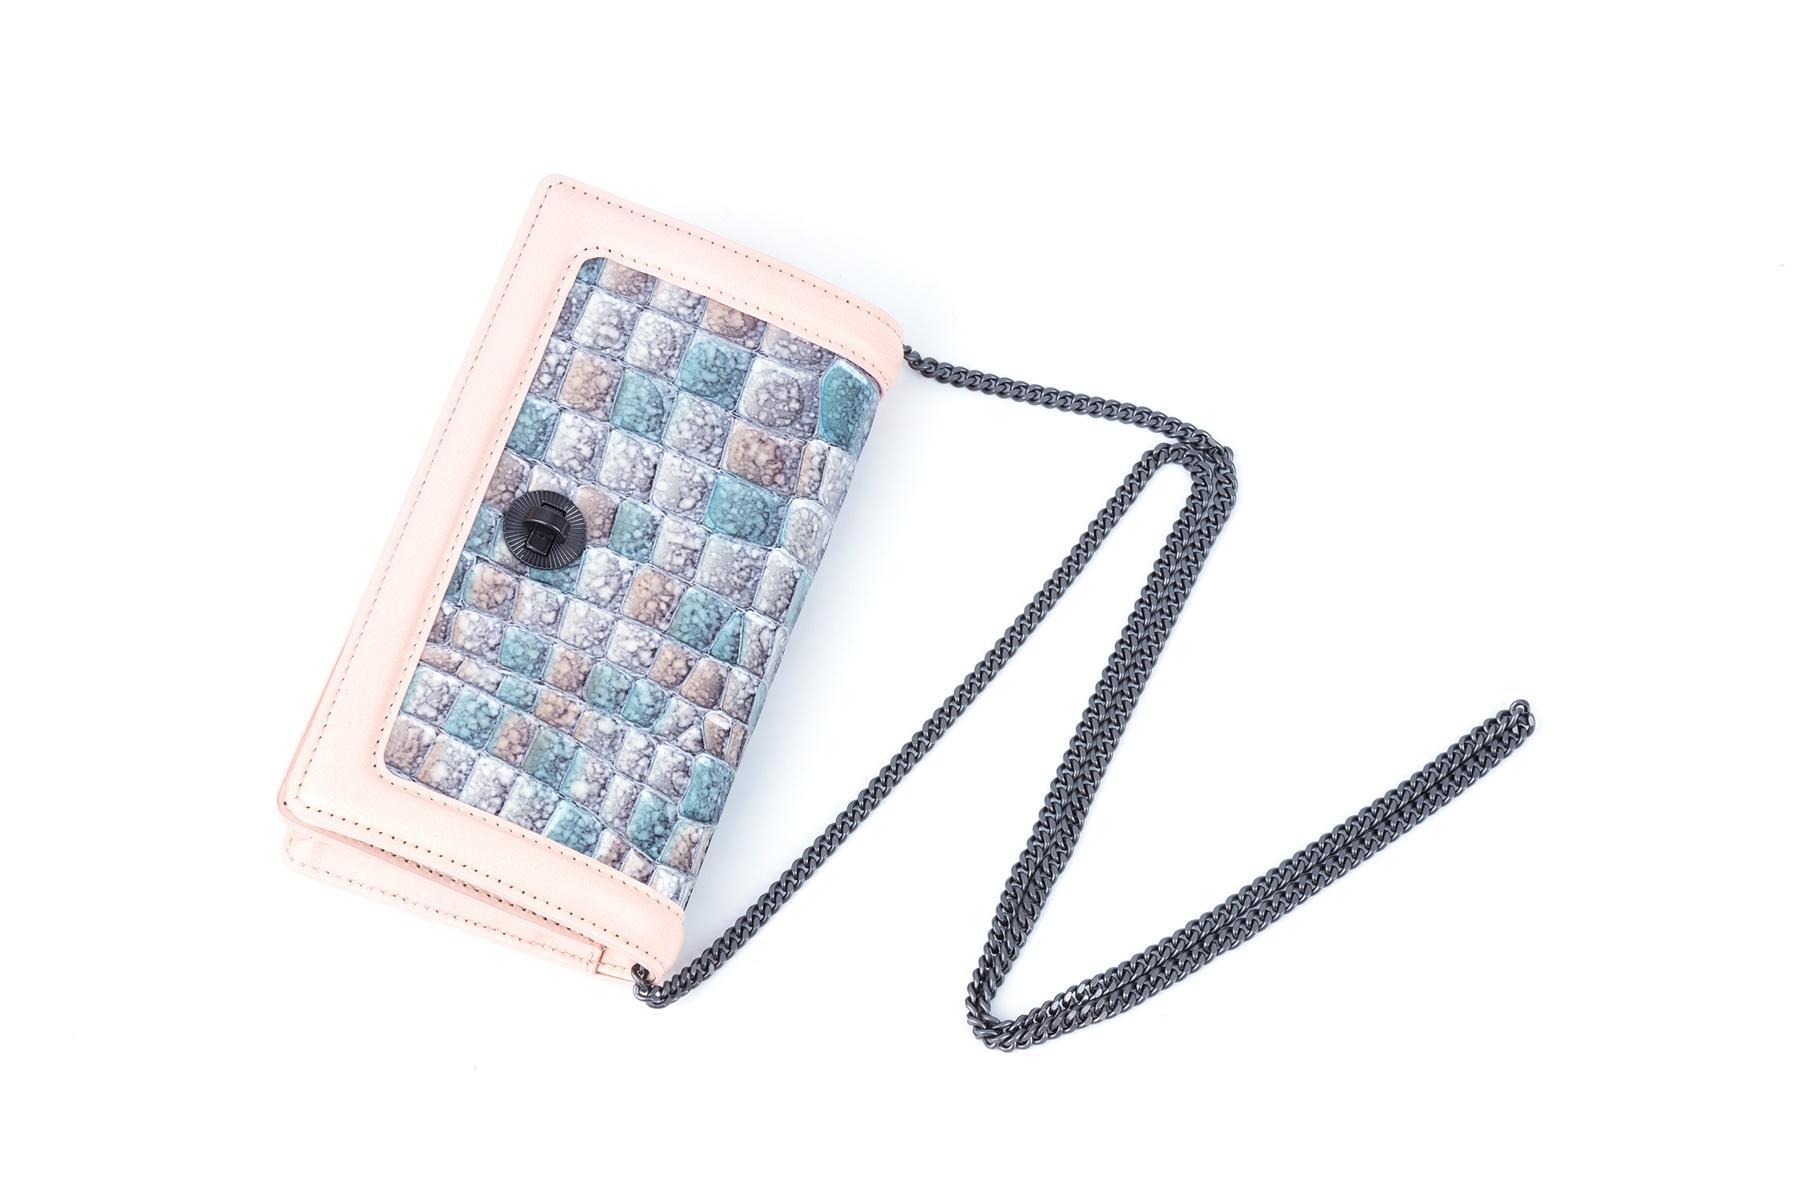 Mini bag genuine leather nylon lining cover with metal turn lock